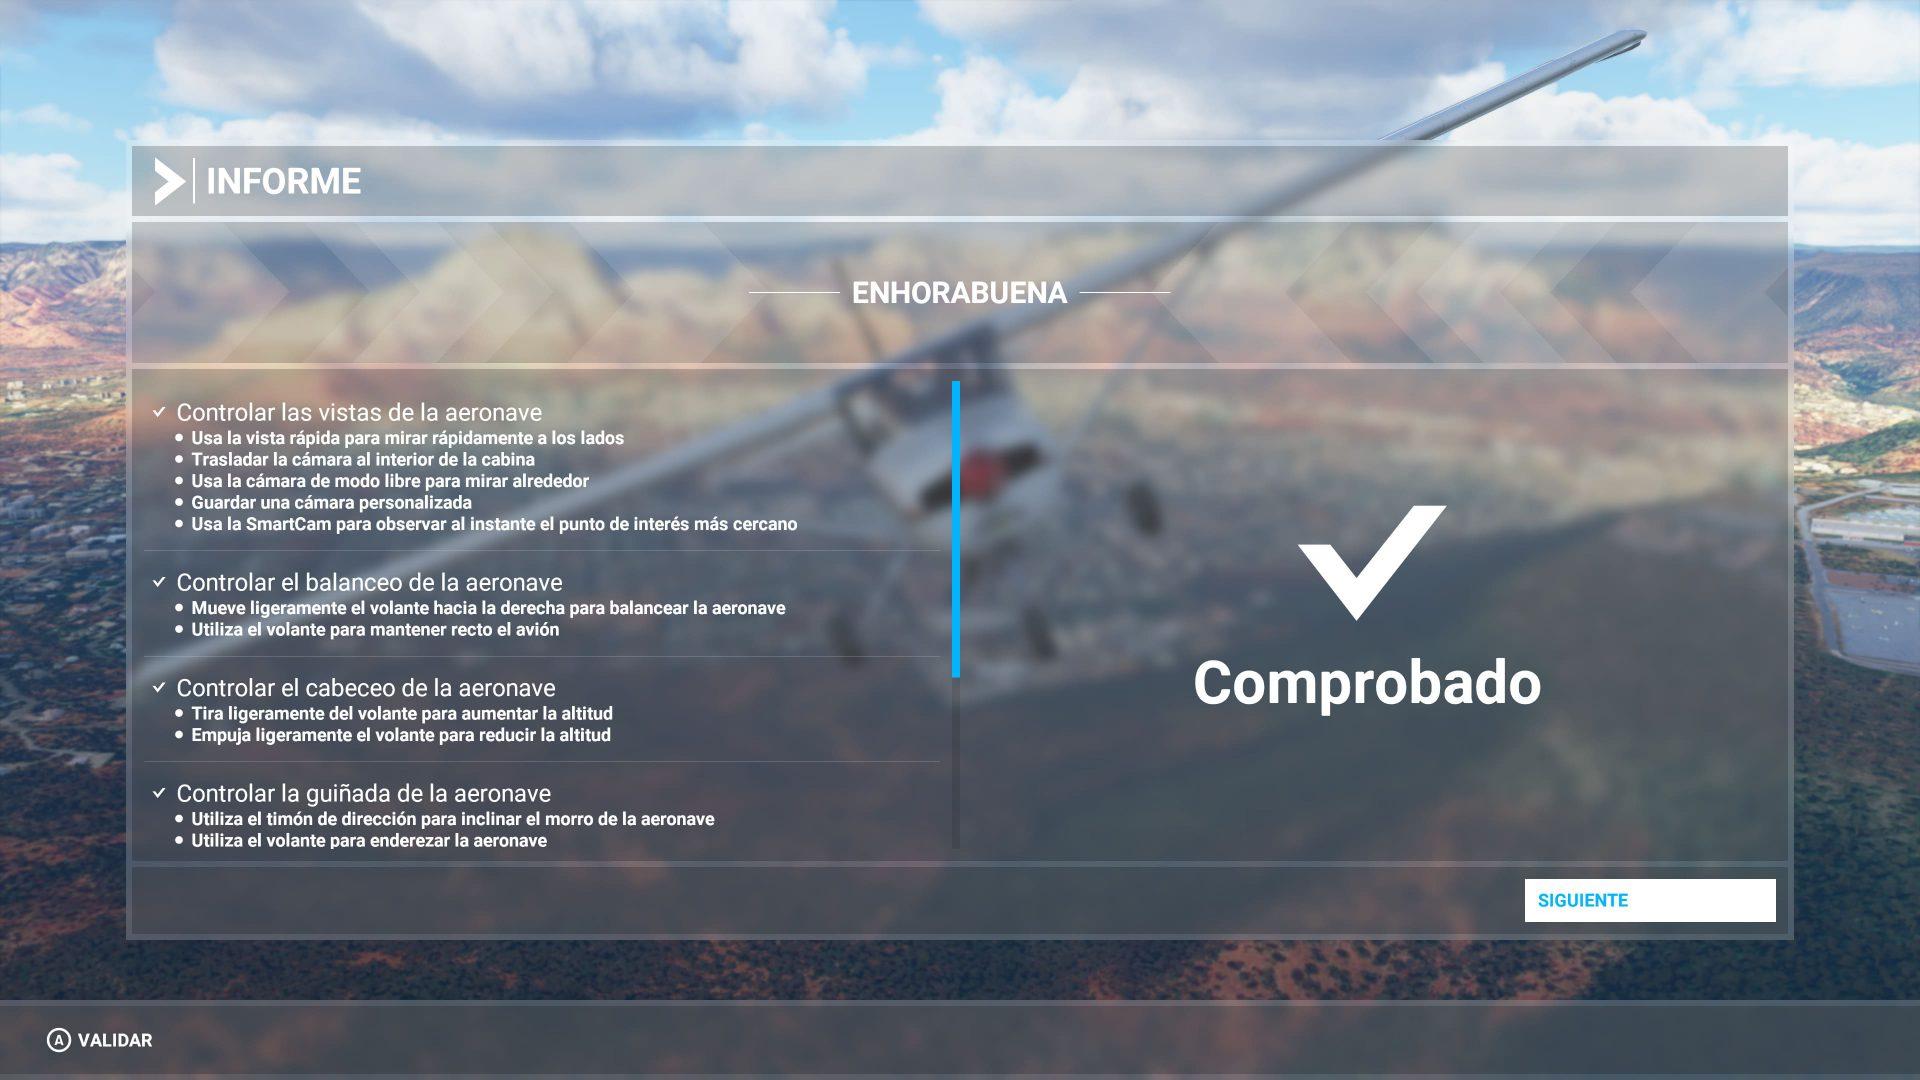 Informe del tutorial Microsoft Flight Simulator